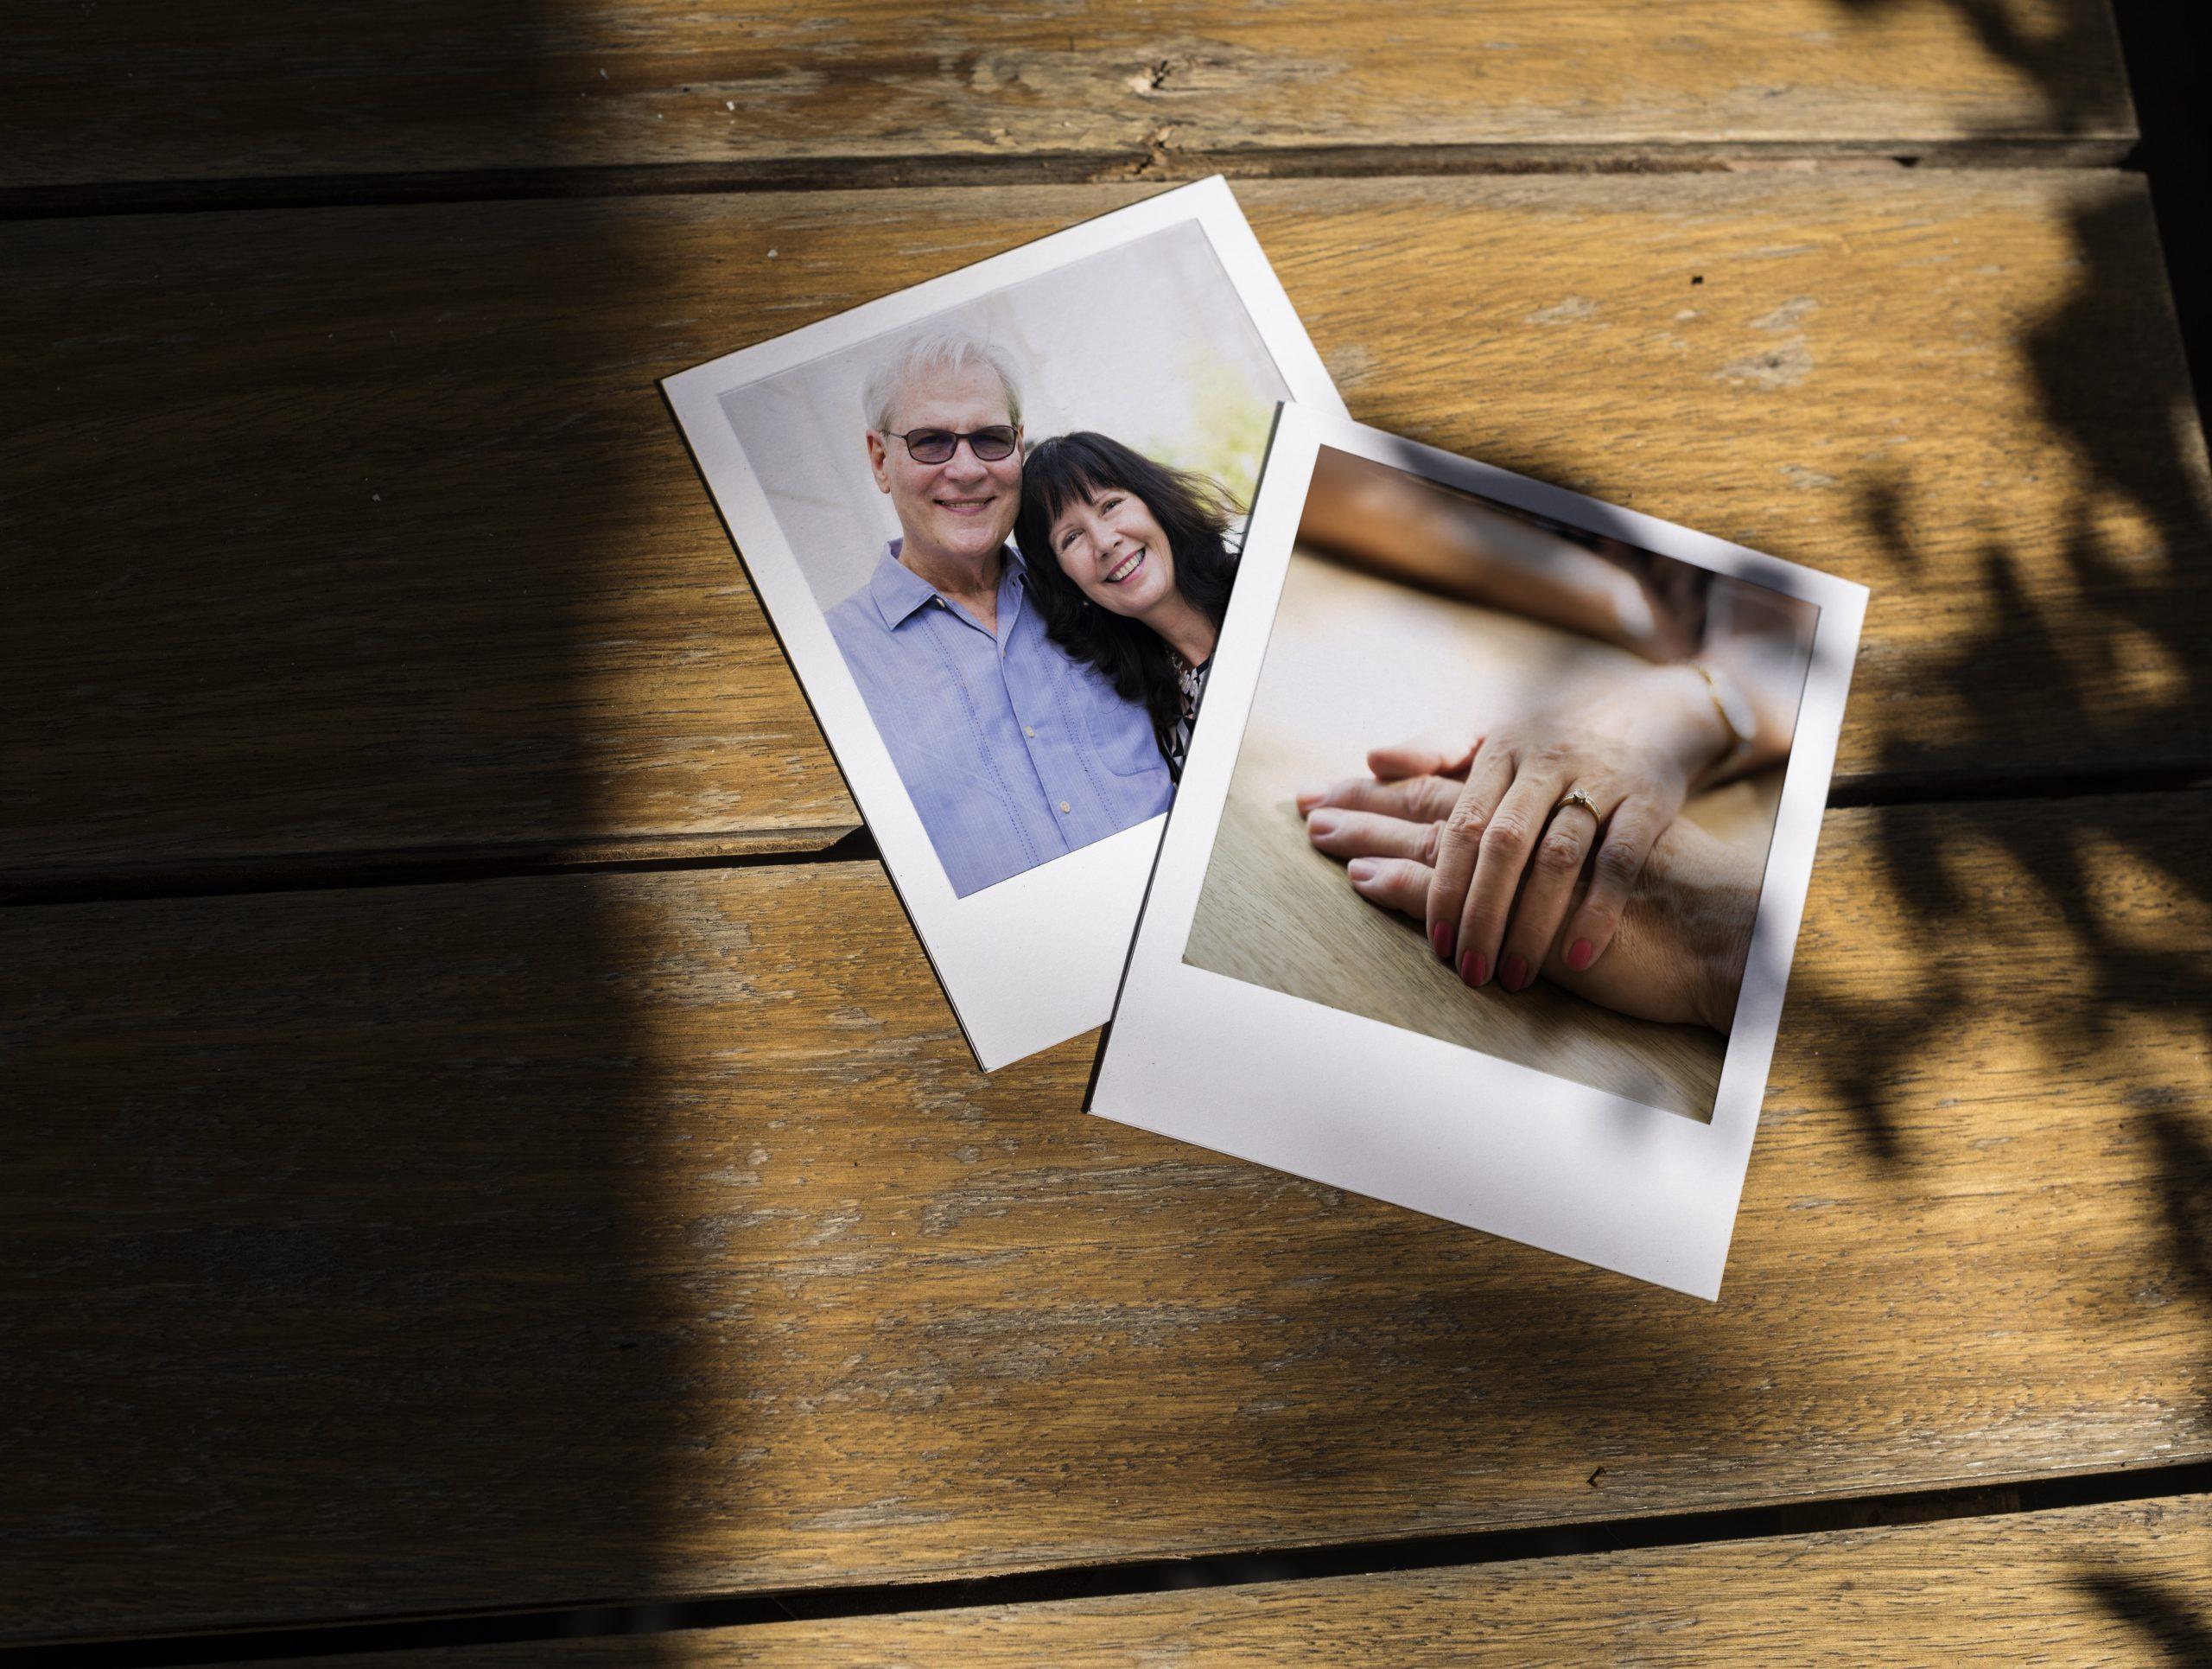 Instant image prints